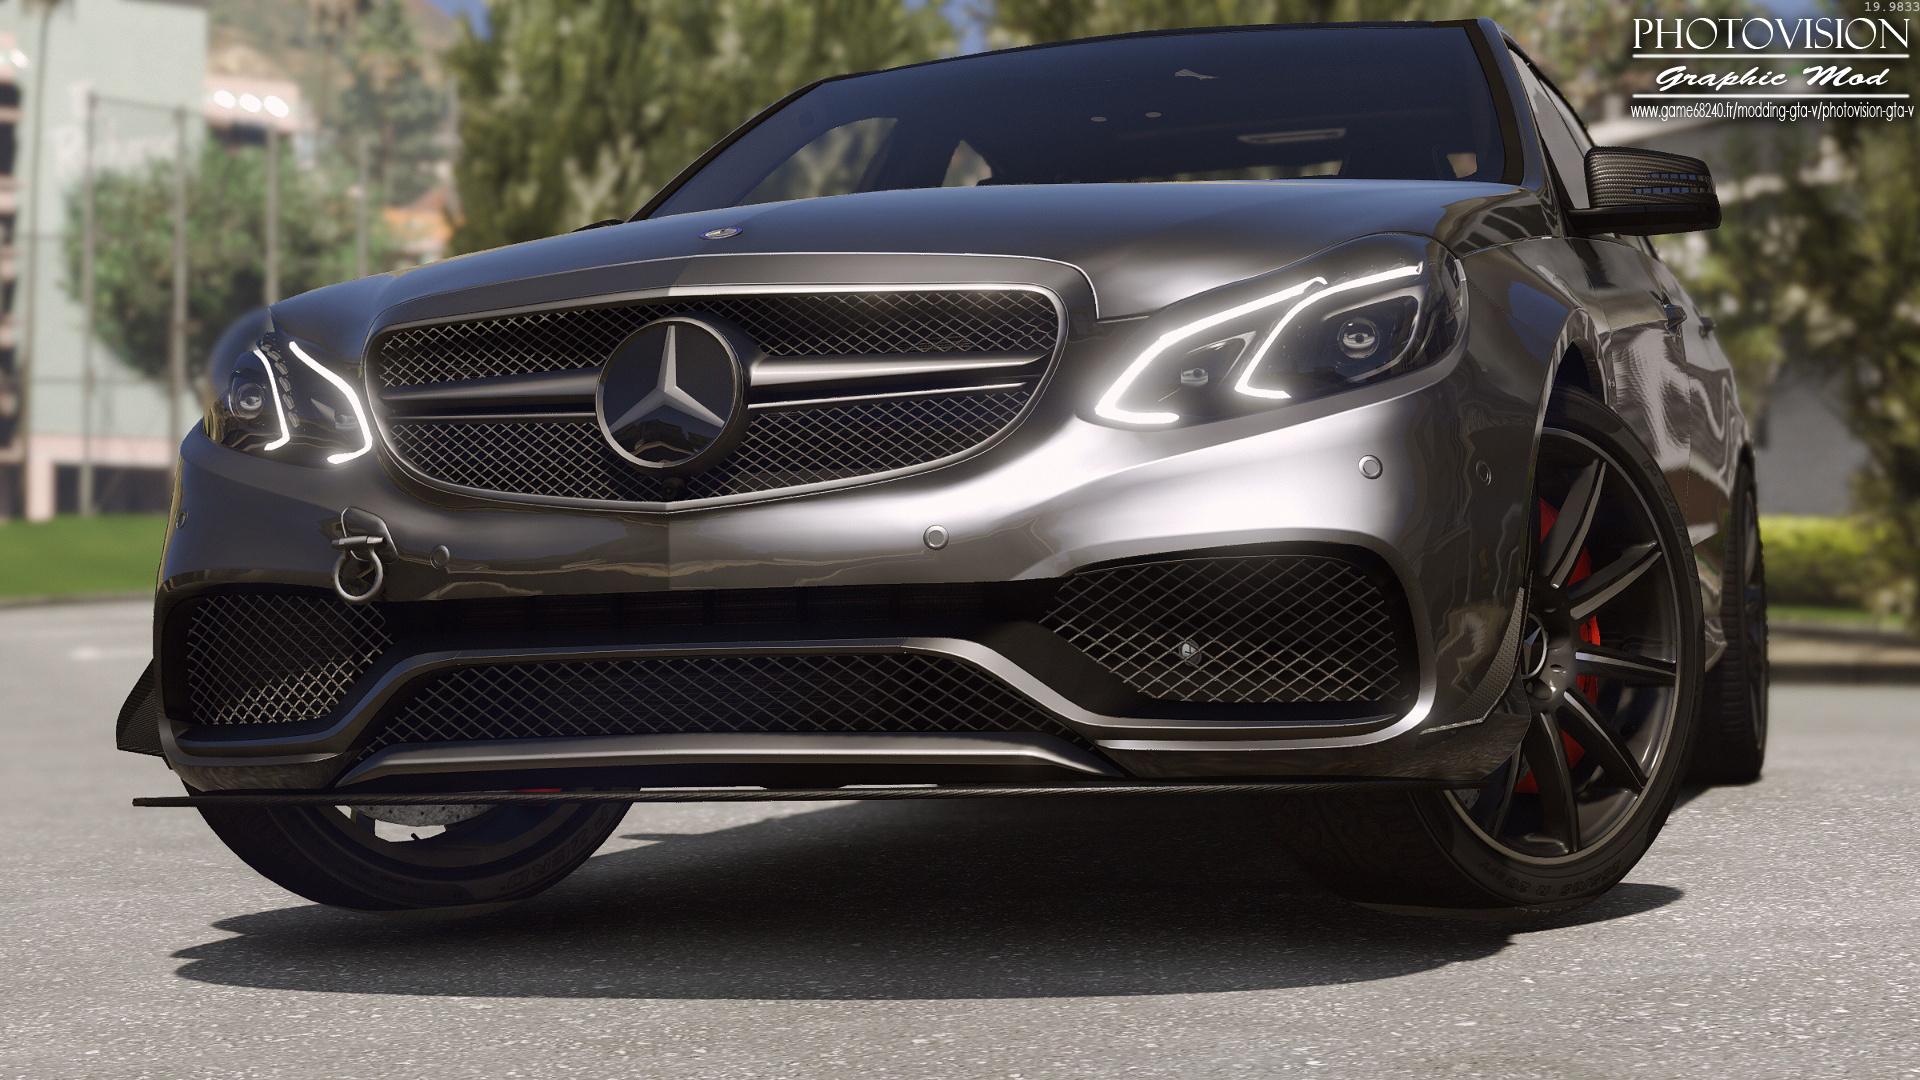 2013 Mercedes Benz E63 AMG [Add Replace Template